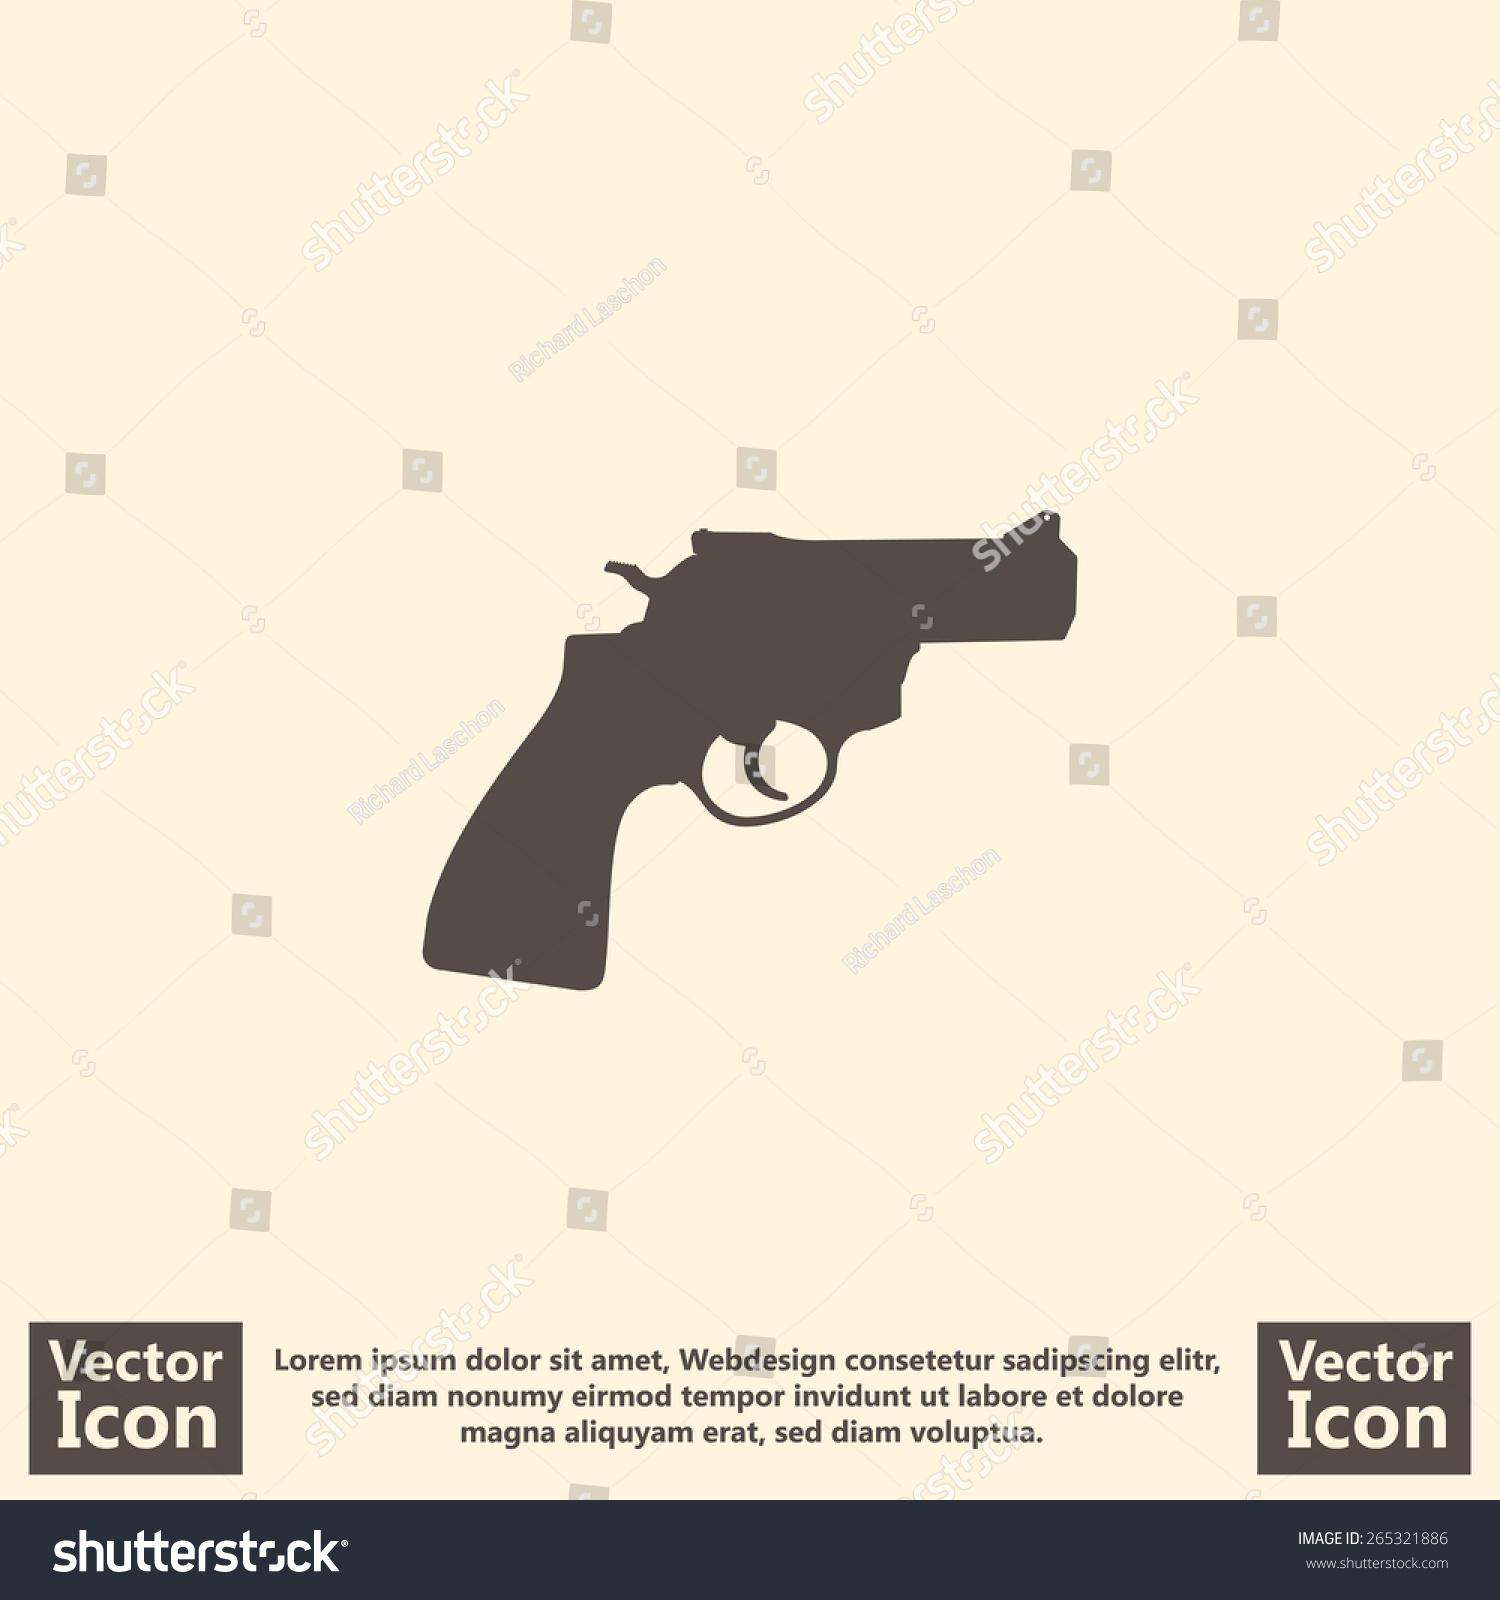 Pistol text symbol gallery symbol and sign ideas pistol text symbol choice image symbol and sign ideas flat style icon pistol symbol stock vector buycottarizona